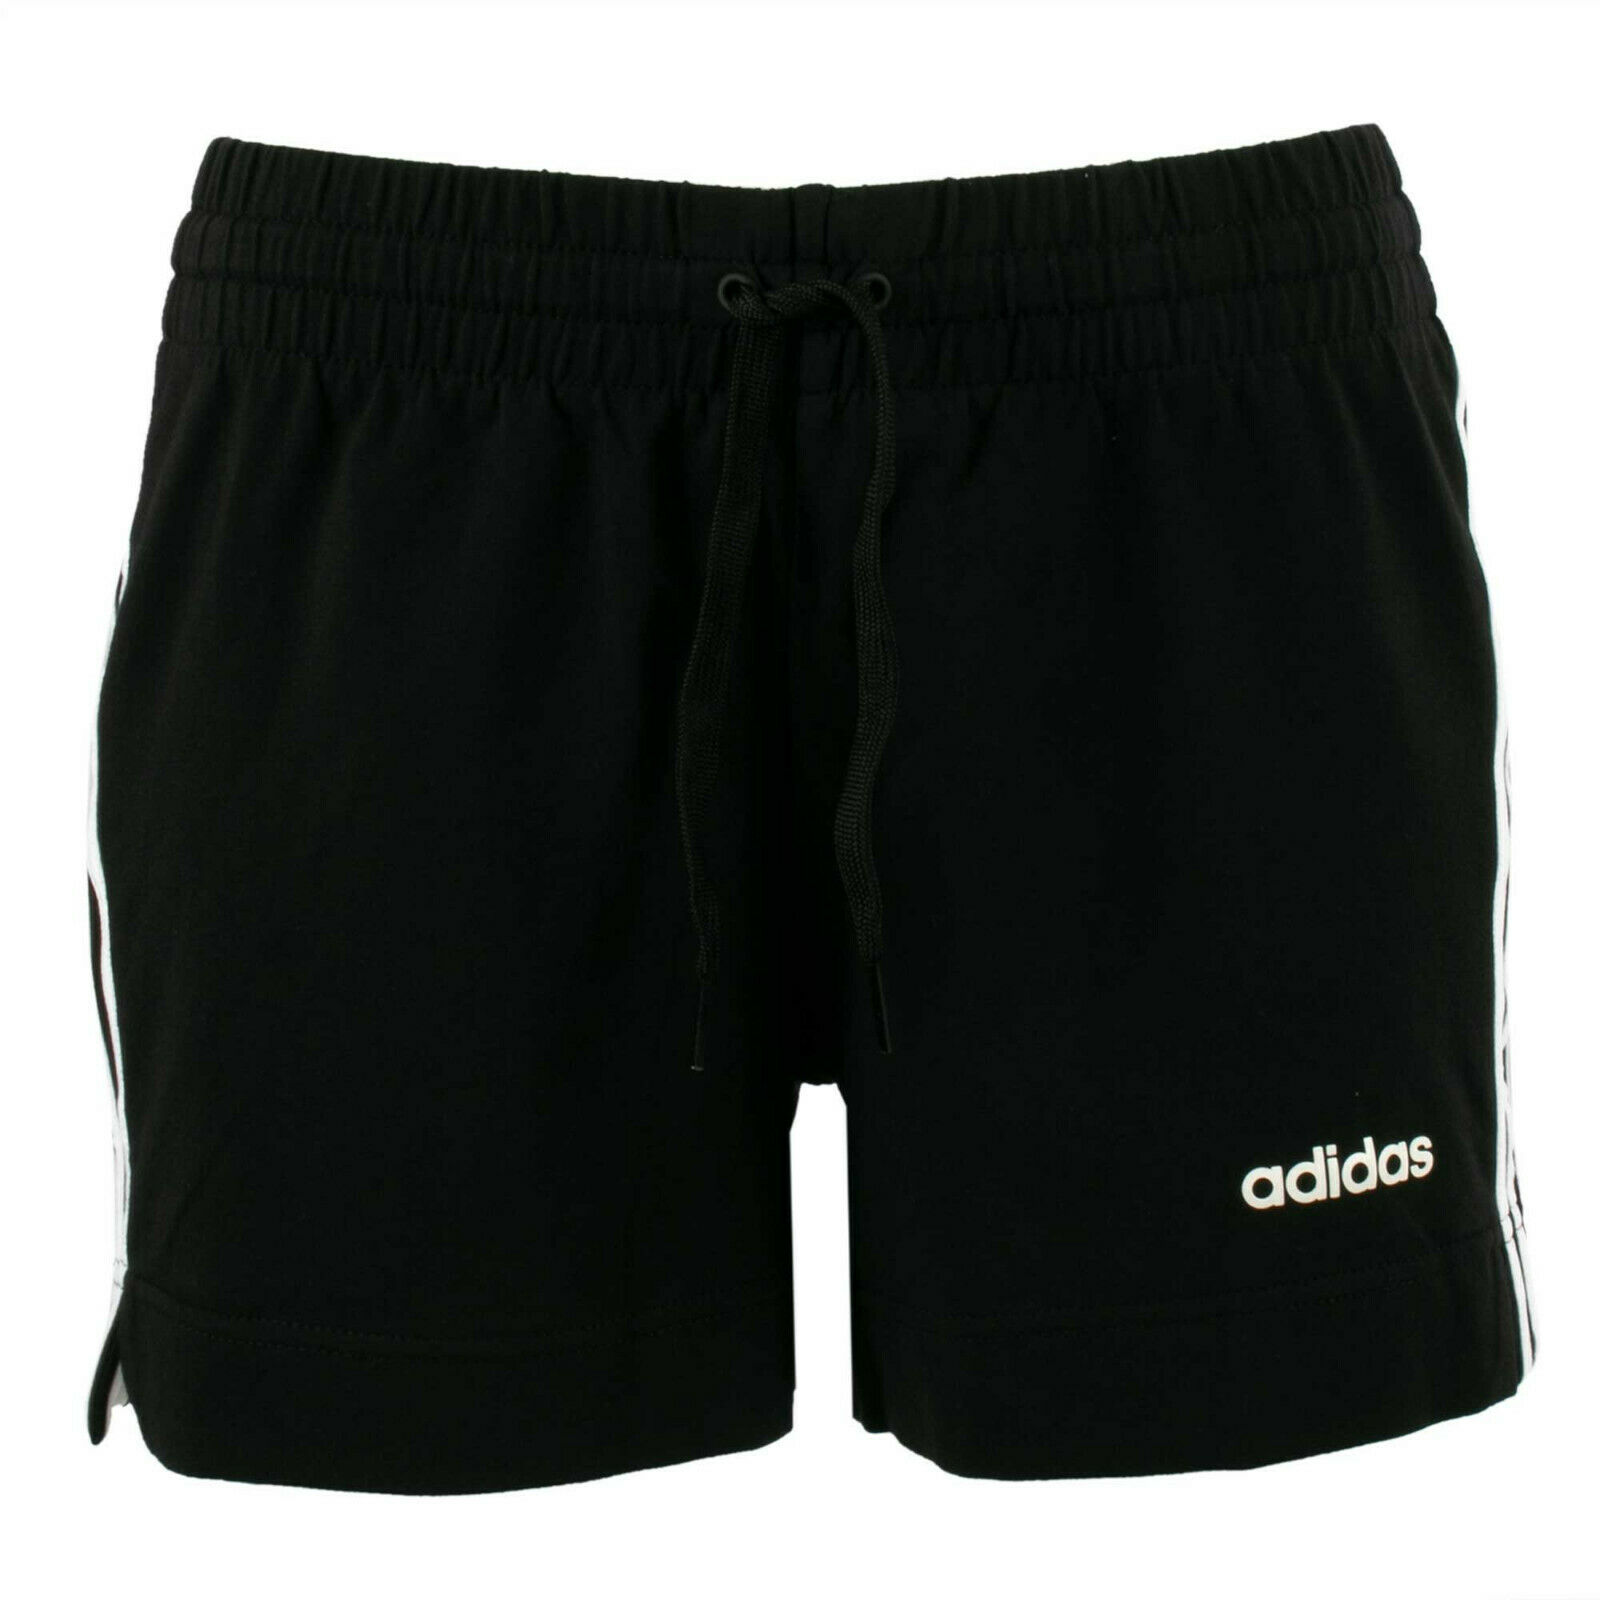 adidas Damen Jersey Shorts DP2405 Essential 3 Stripes Schwarz / S / kurze Hose